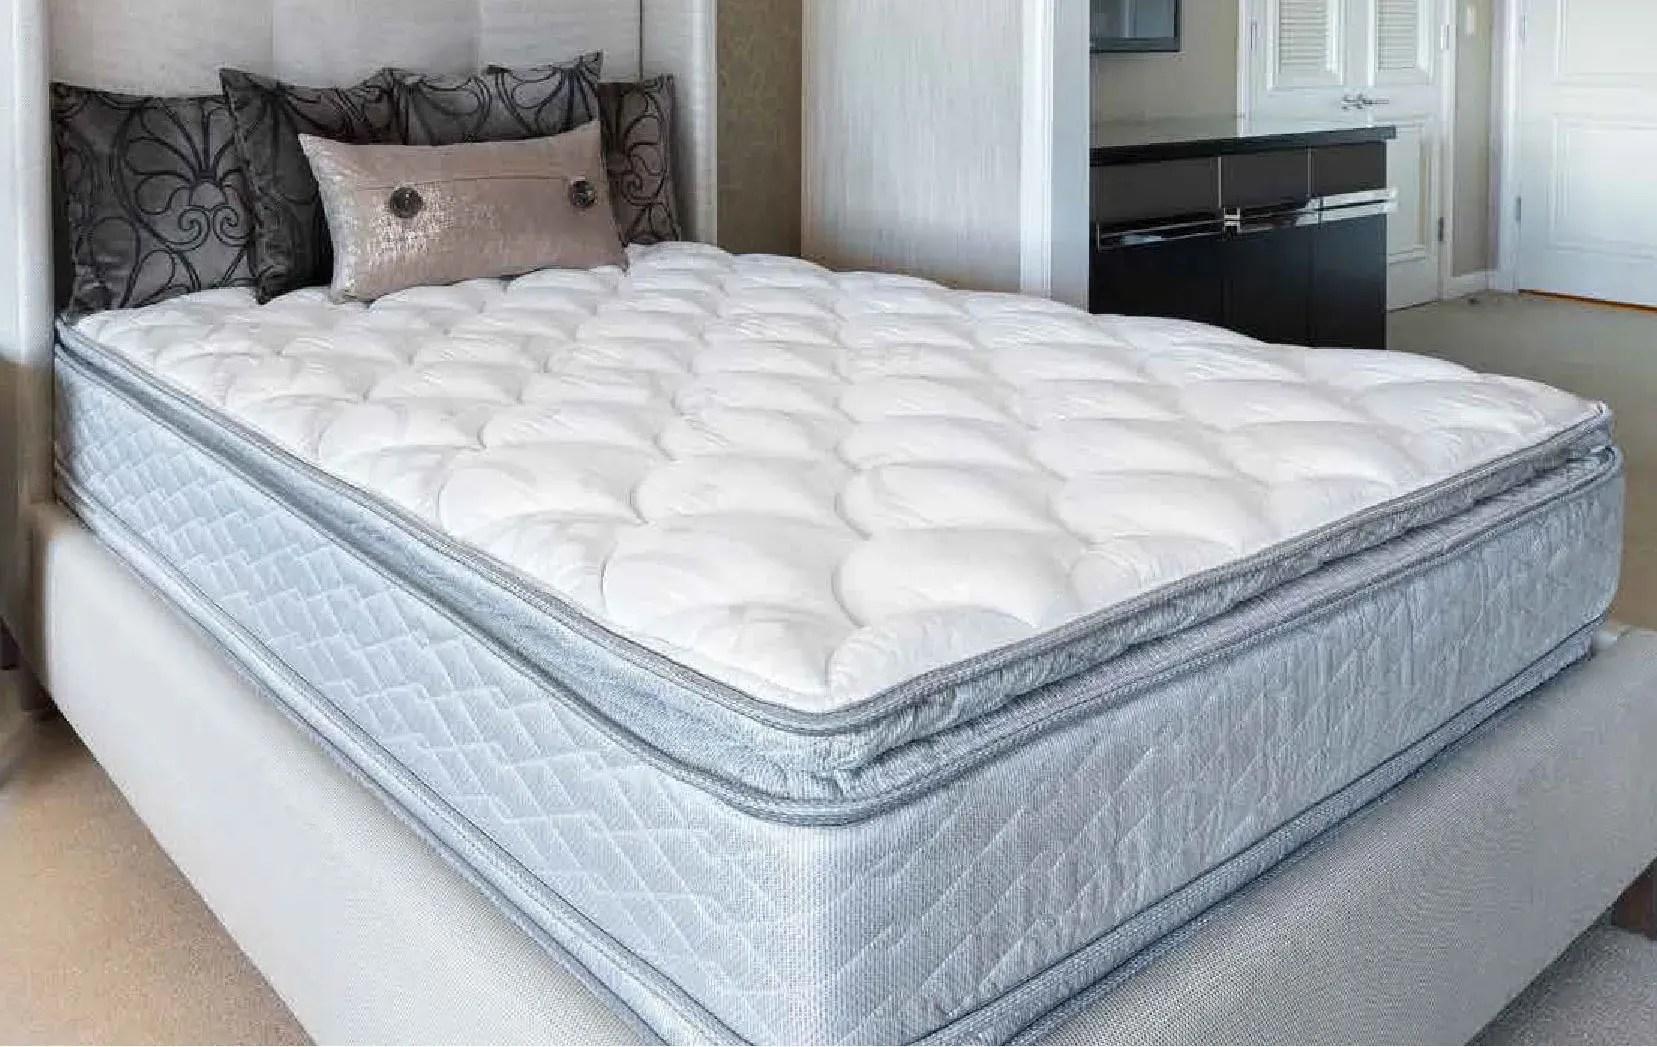 double sided pillow top mattress online